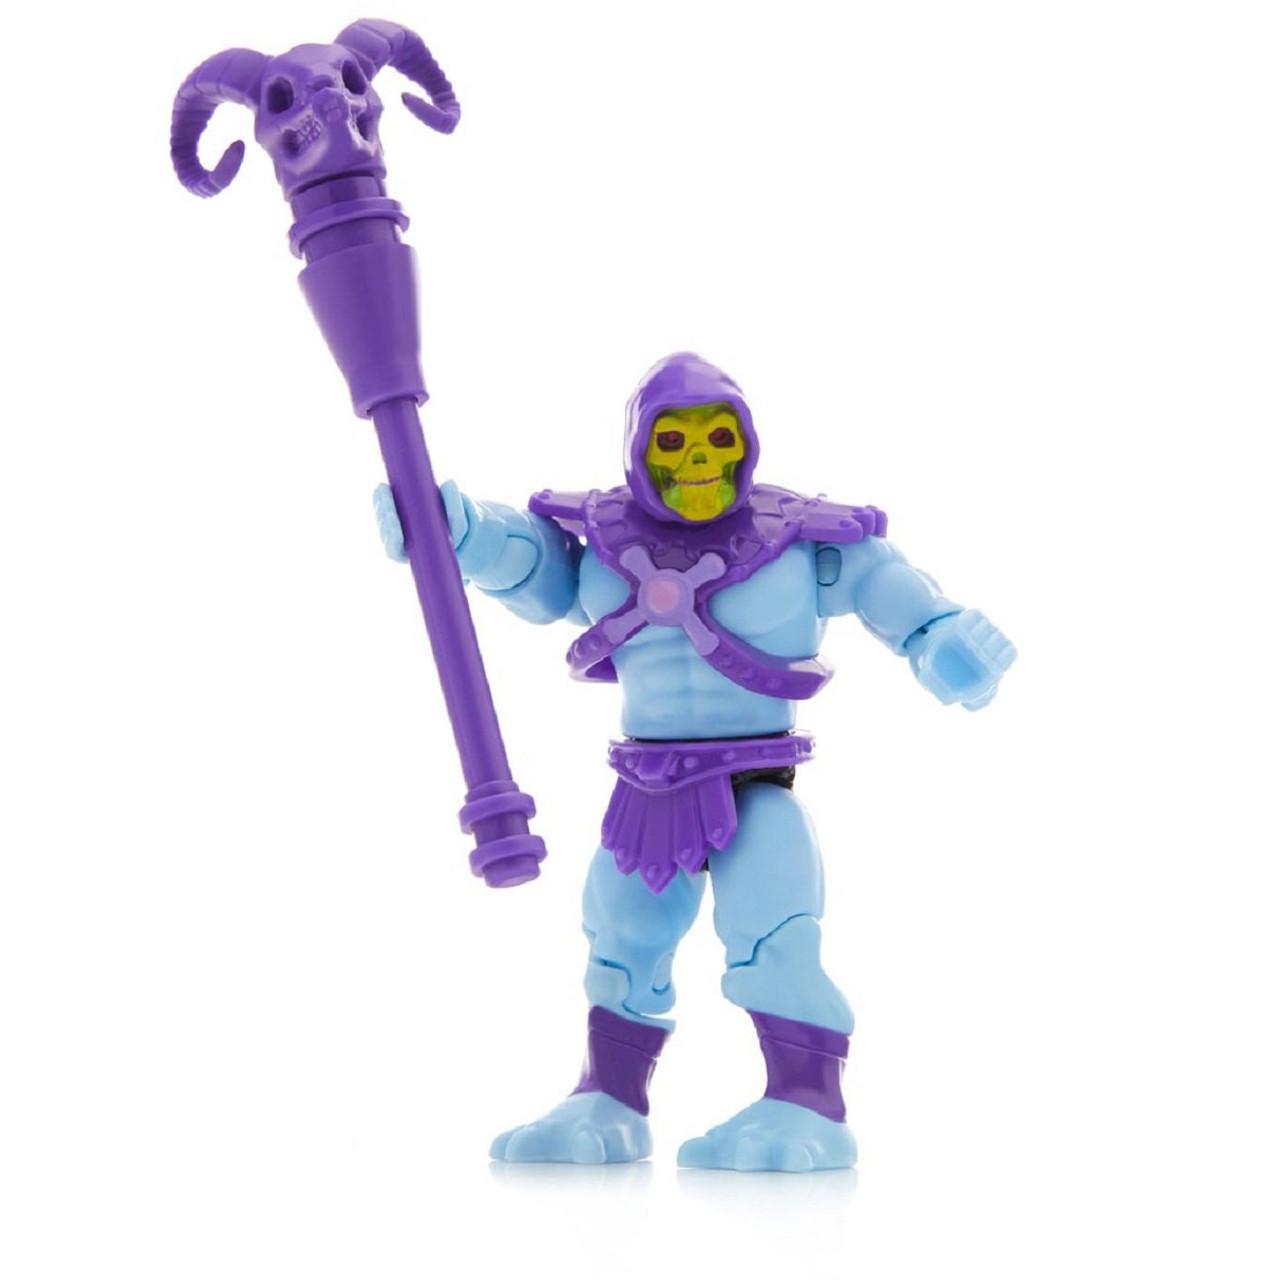 Mega Construx Heroes Series 1 Masters of the Universe Skeletor Figure